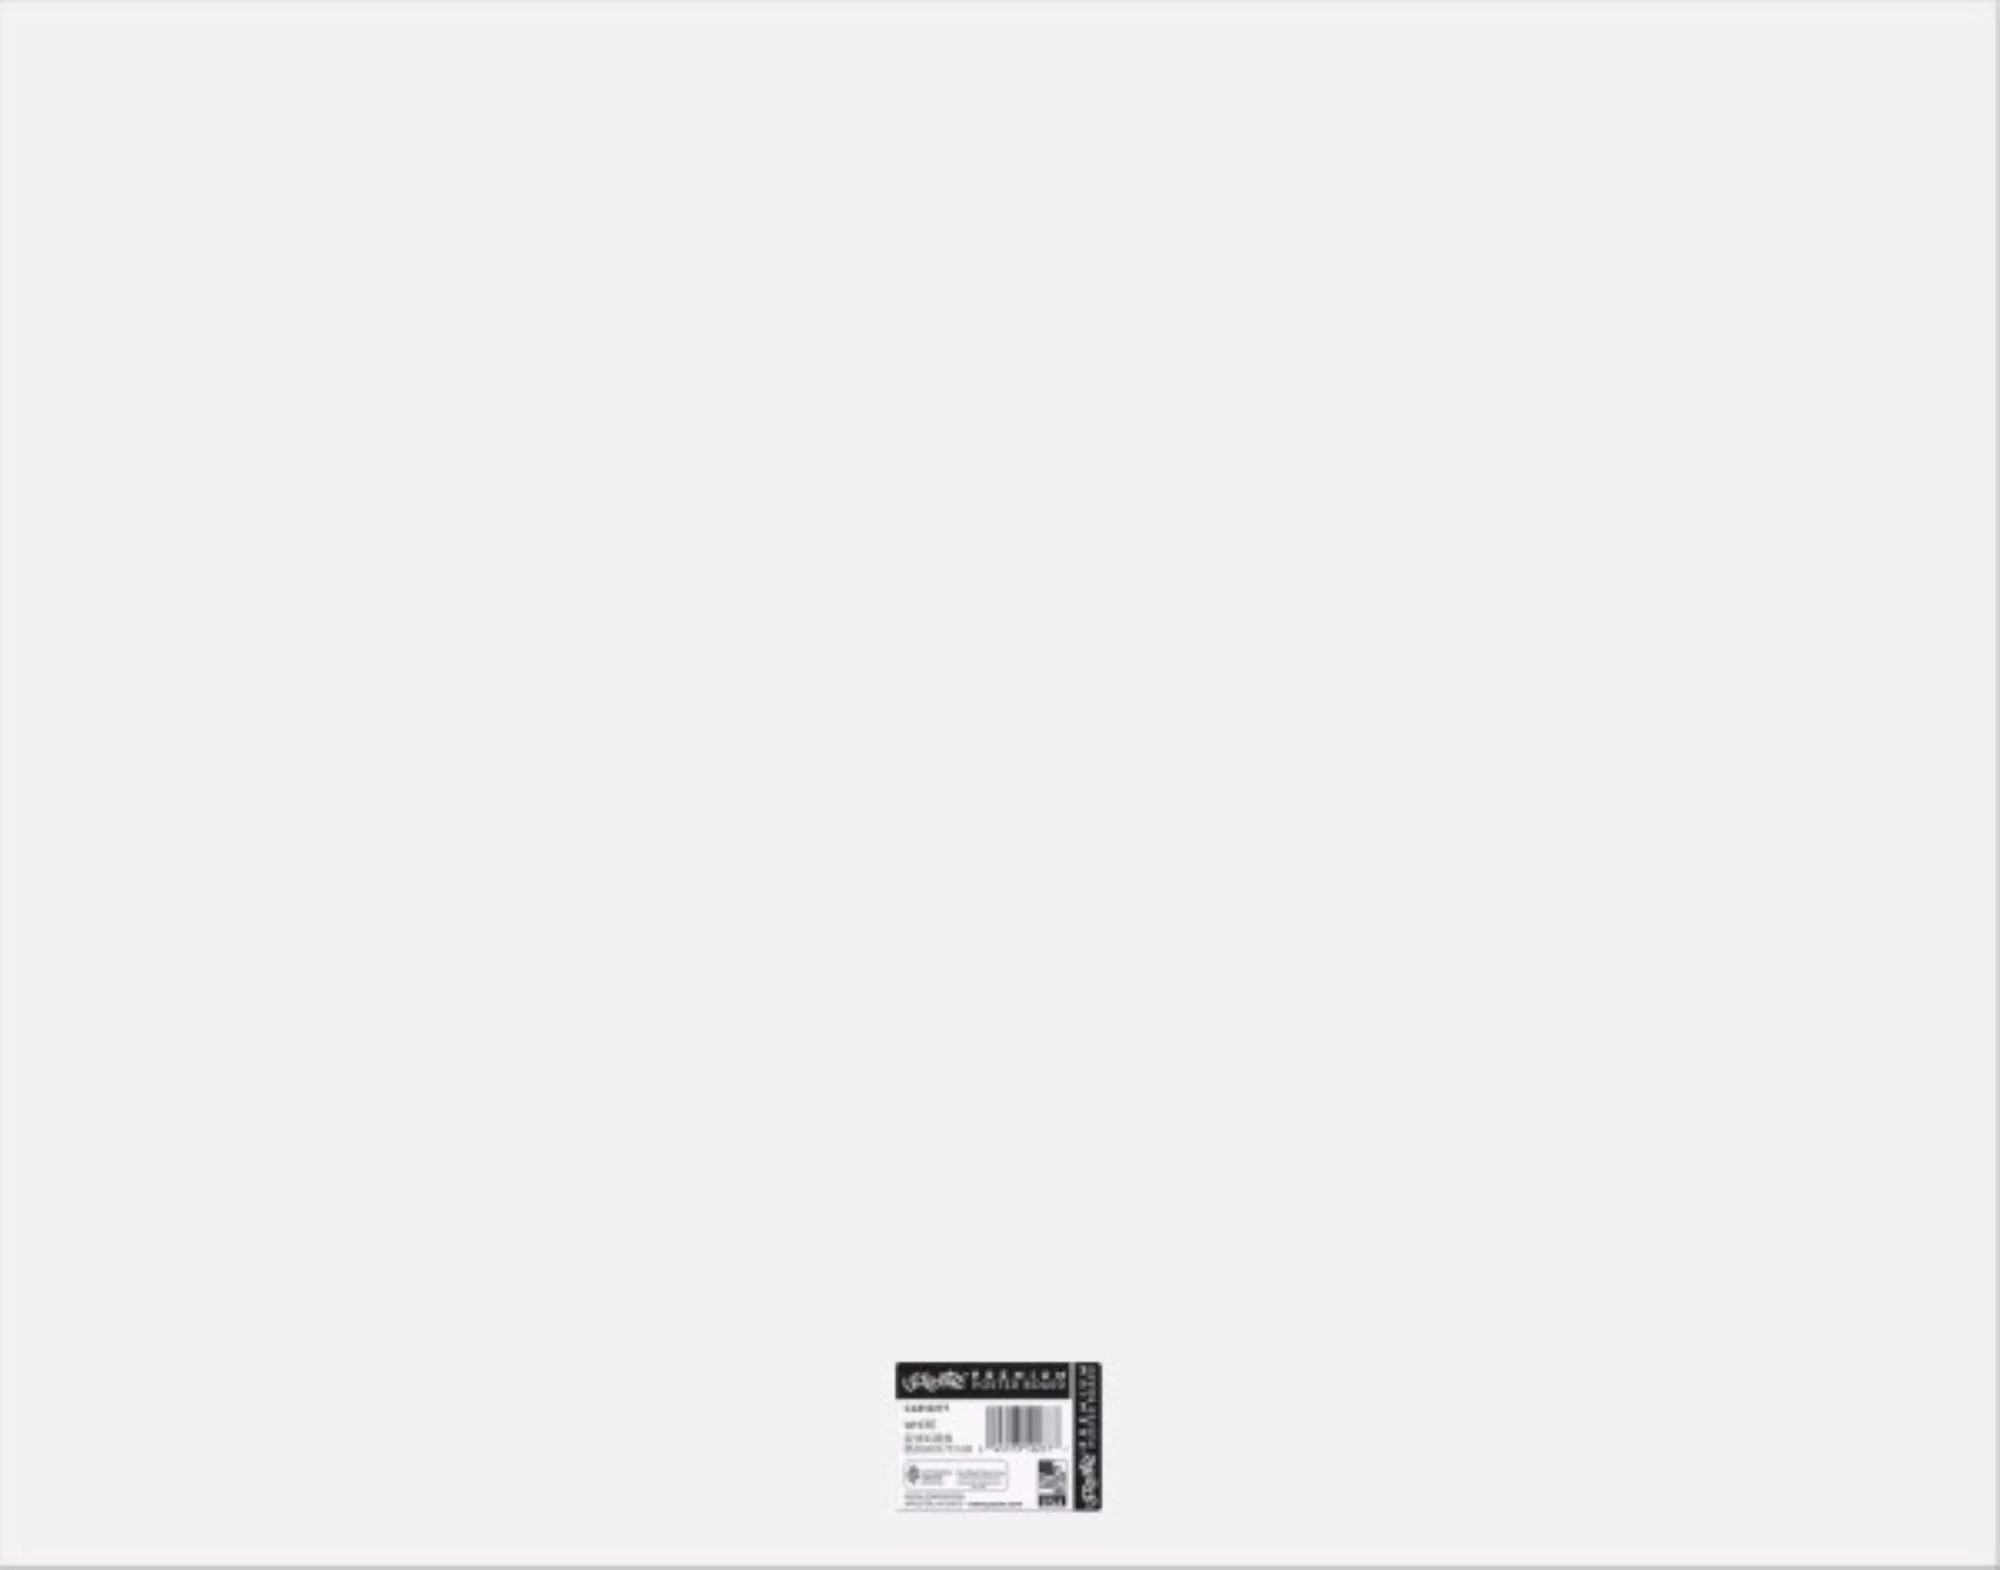 ucreate foam poster board white 22 x 28 25 sheets